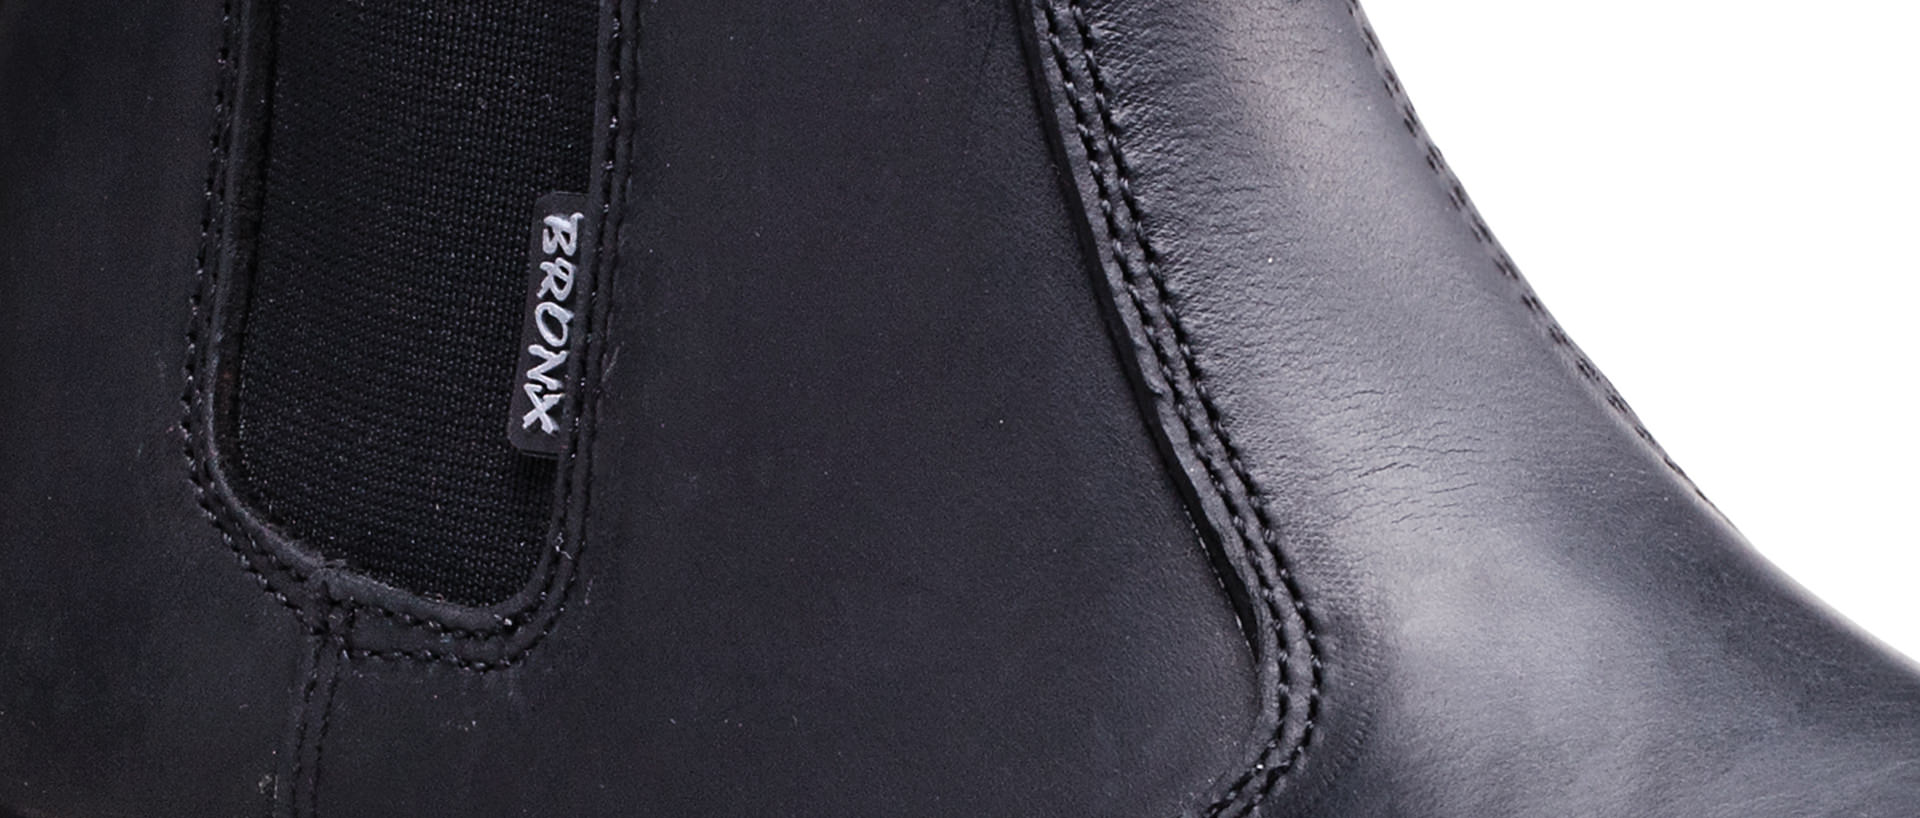 chelsea_black_specific_shoe_screen_width_detail_shot_1920px_818px